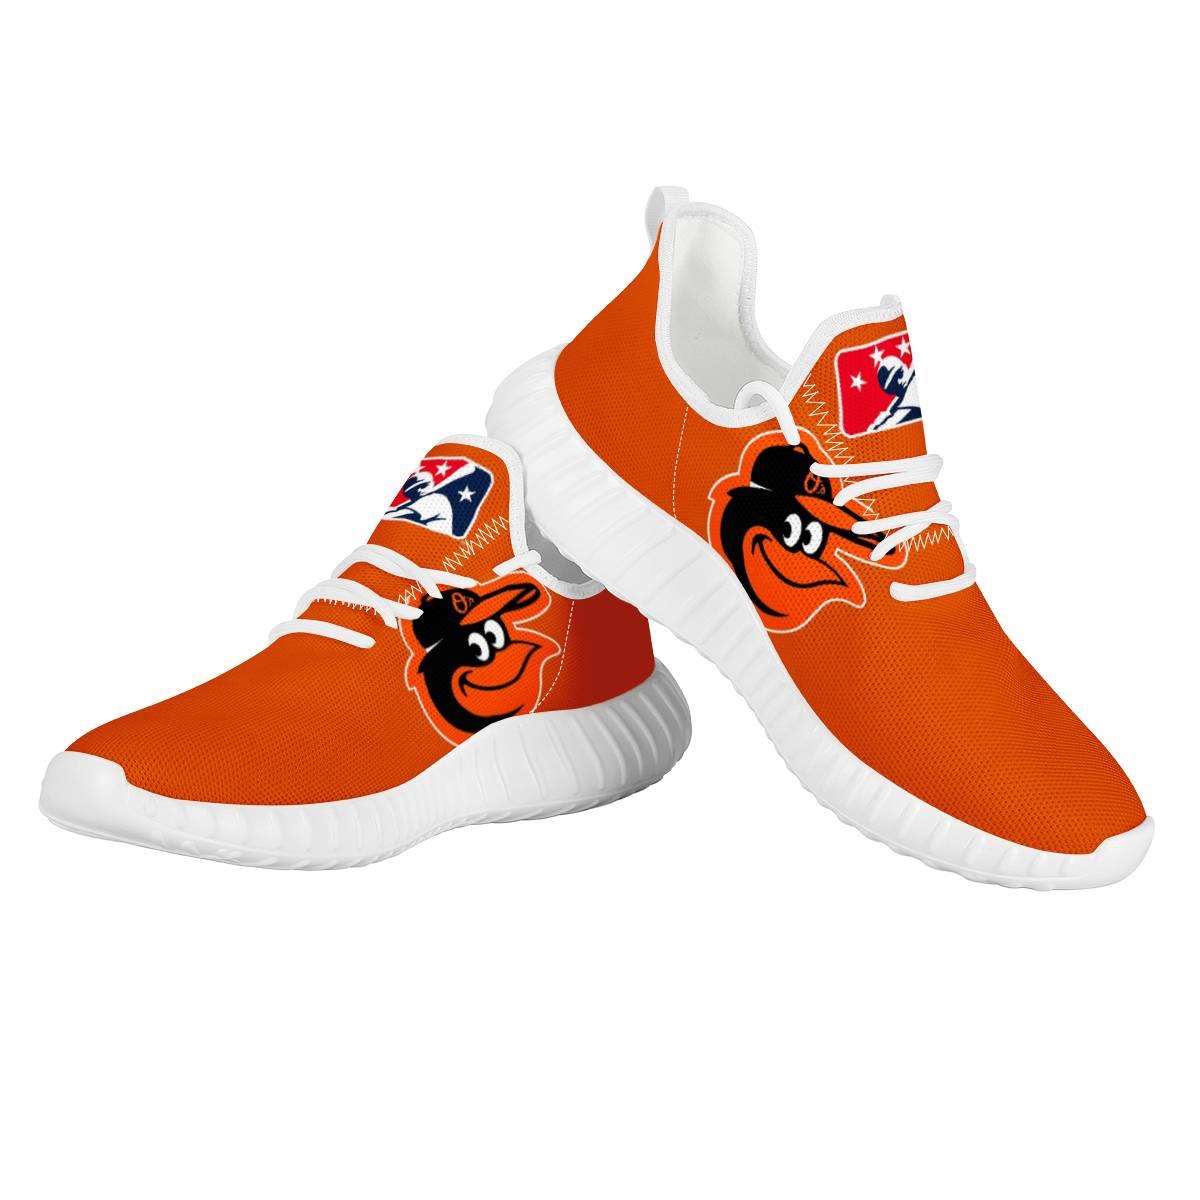 Baltimore Orioles Shoes